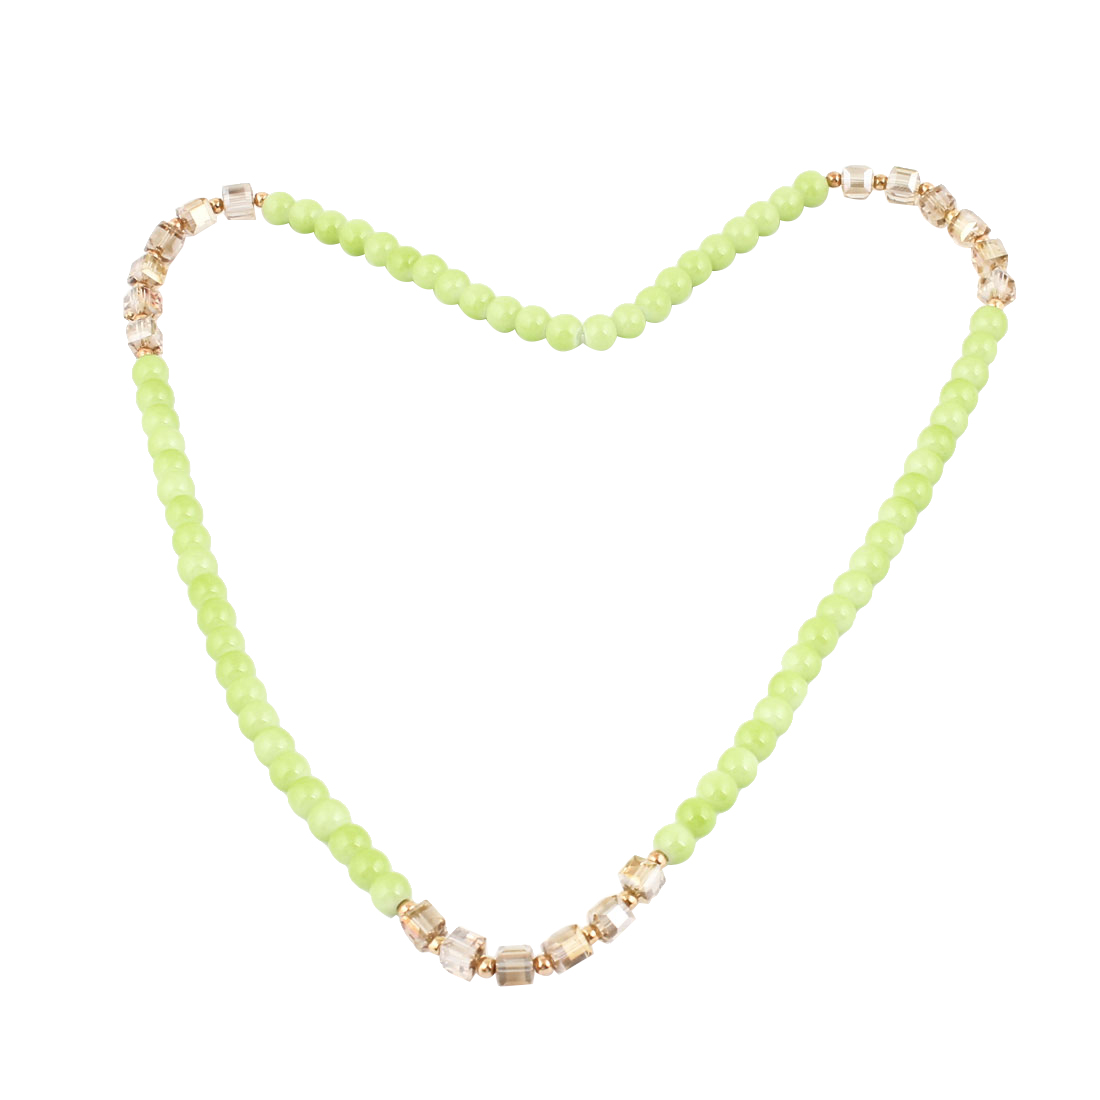 Green Beads Plastic Crystal Detail Pendant Bracelet Ring Necklace for Girls